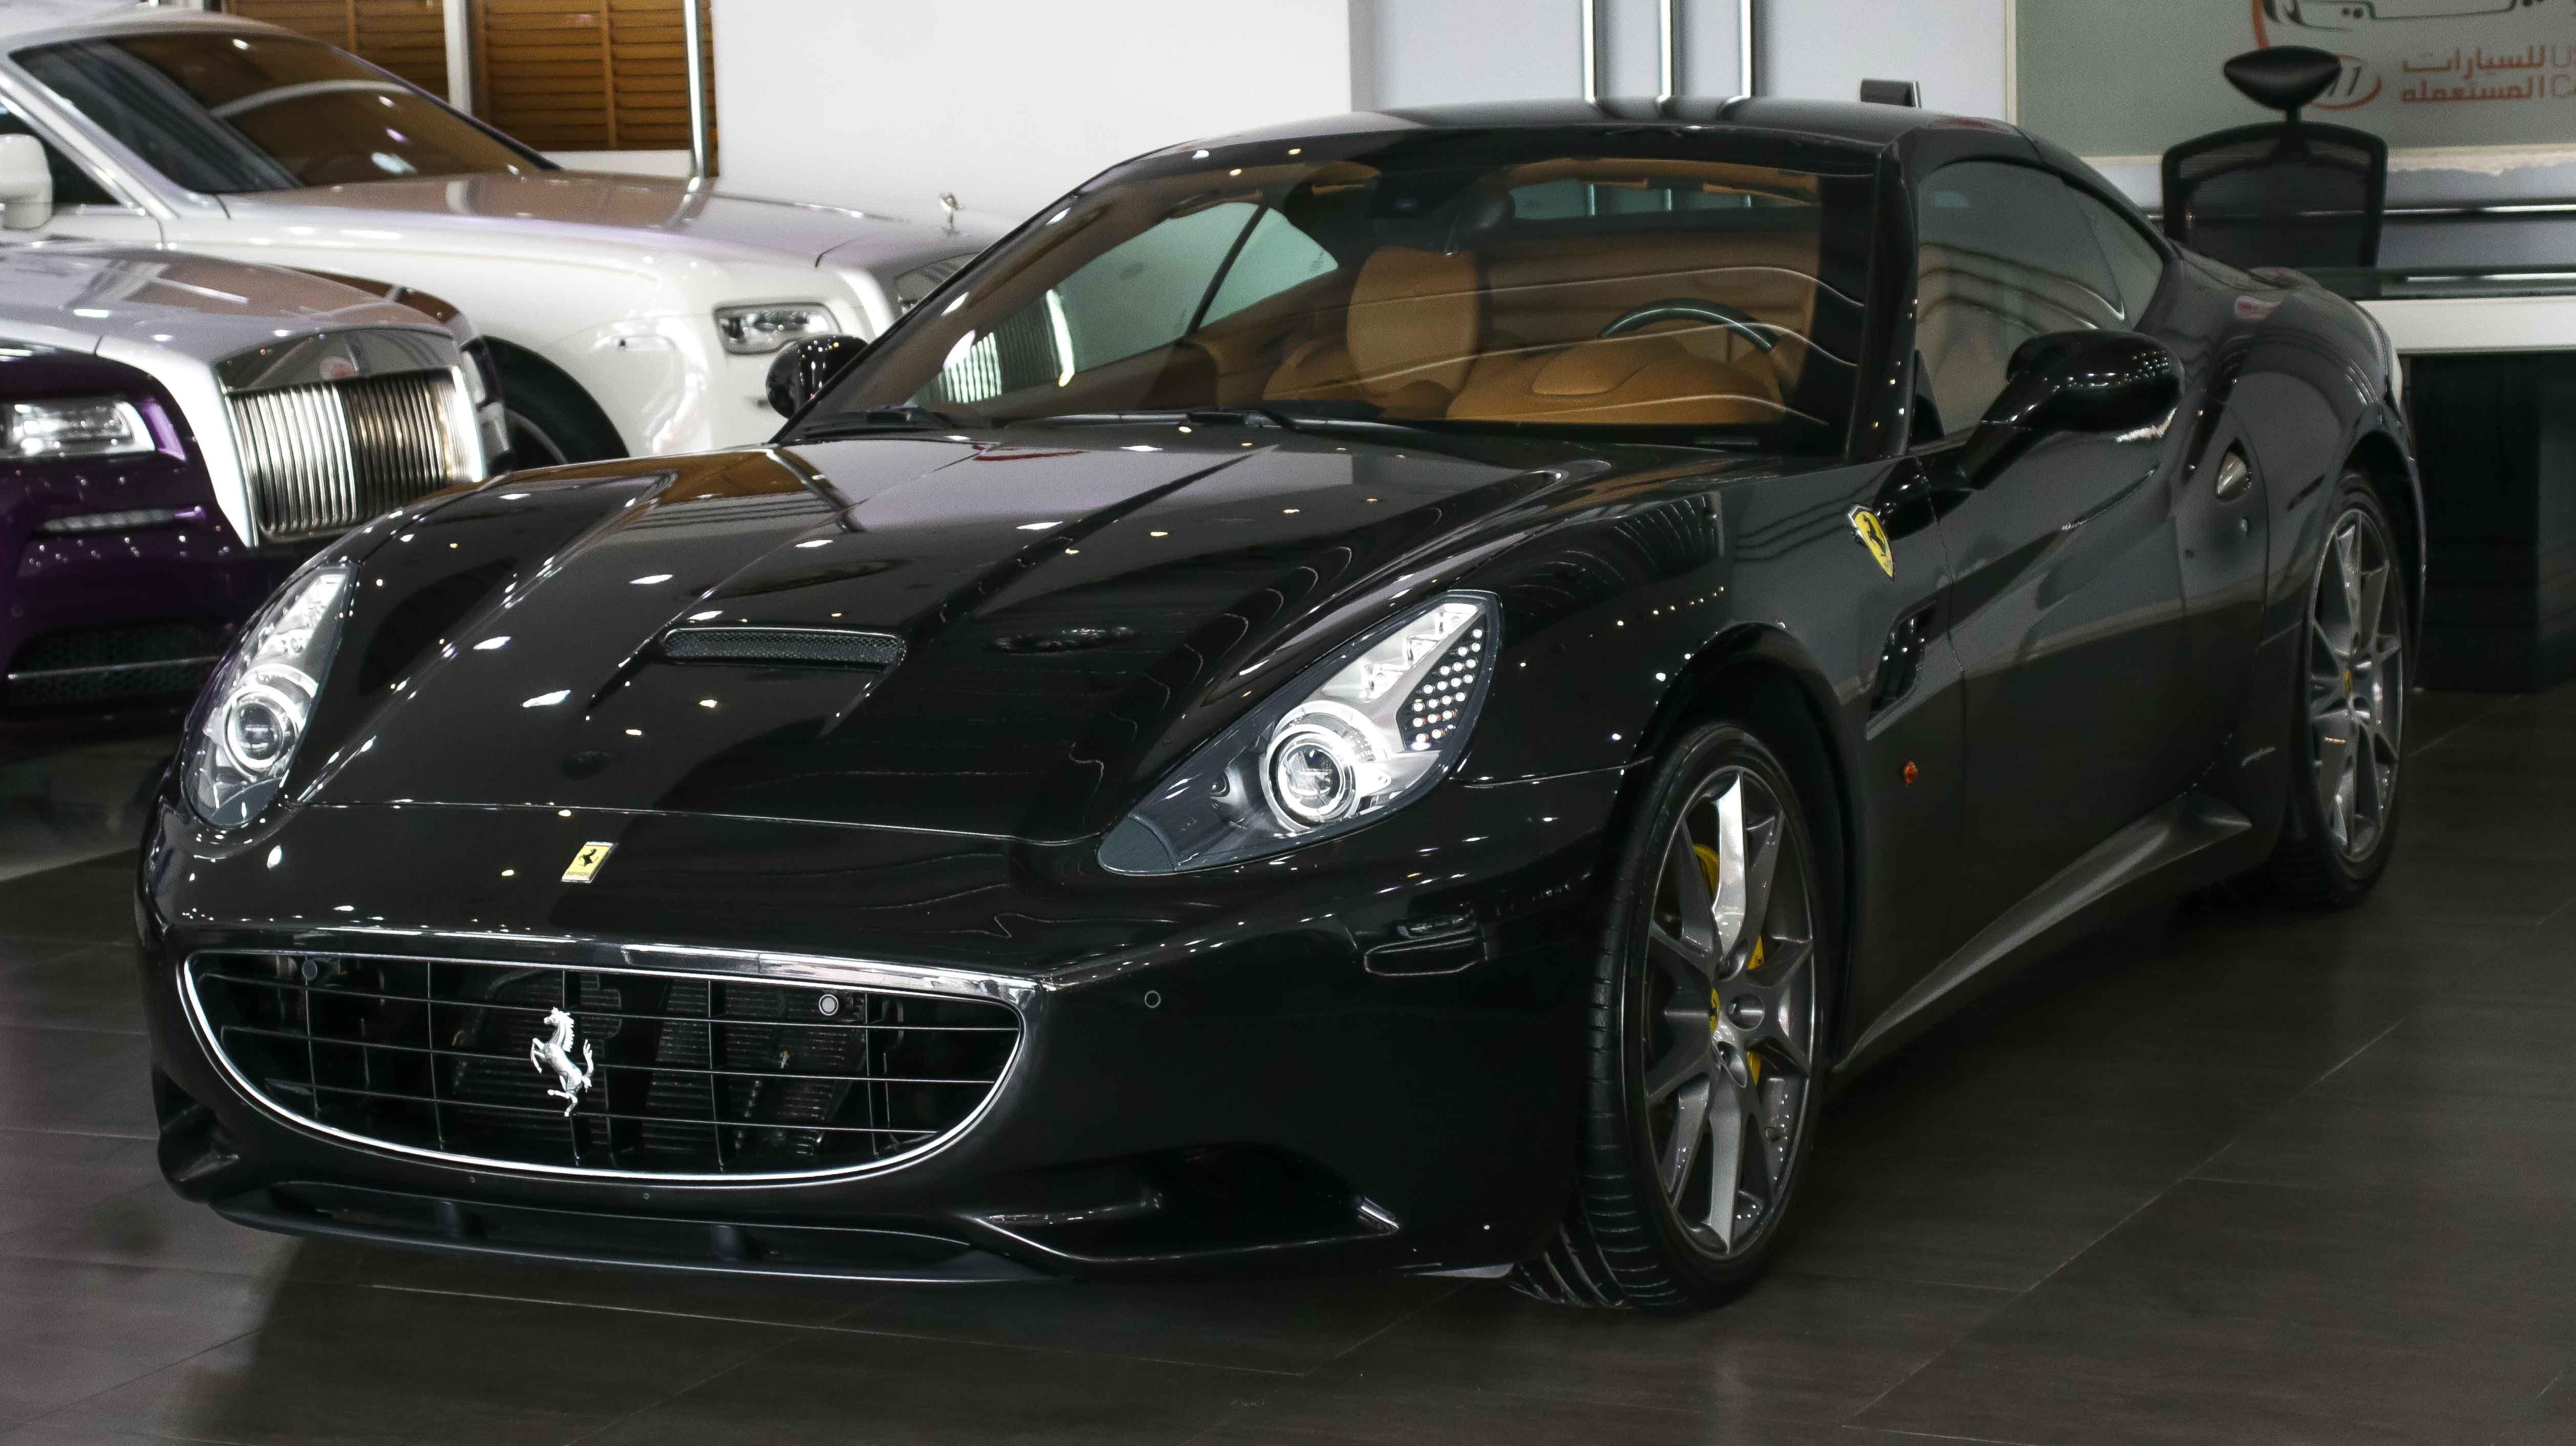 Model Ferrari California Year 2010 Km 16 000 Price Uae